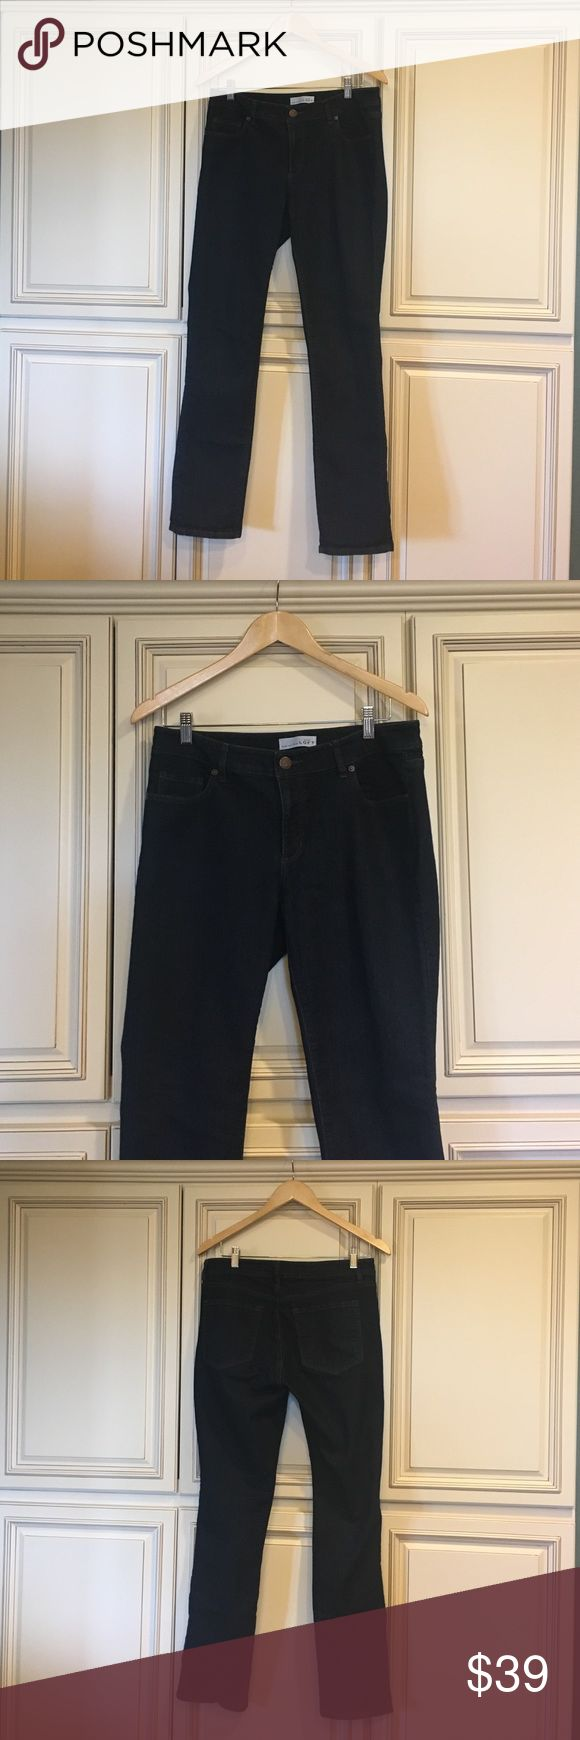 Loft Curvy Jeans Loft curvy straight-leg dark wash jeans. Worn only a handful of times. LOFT Jeans Straight Leg